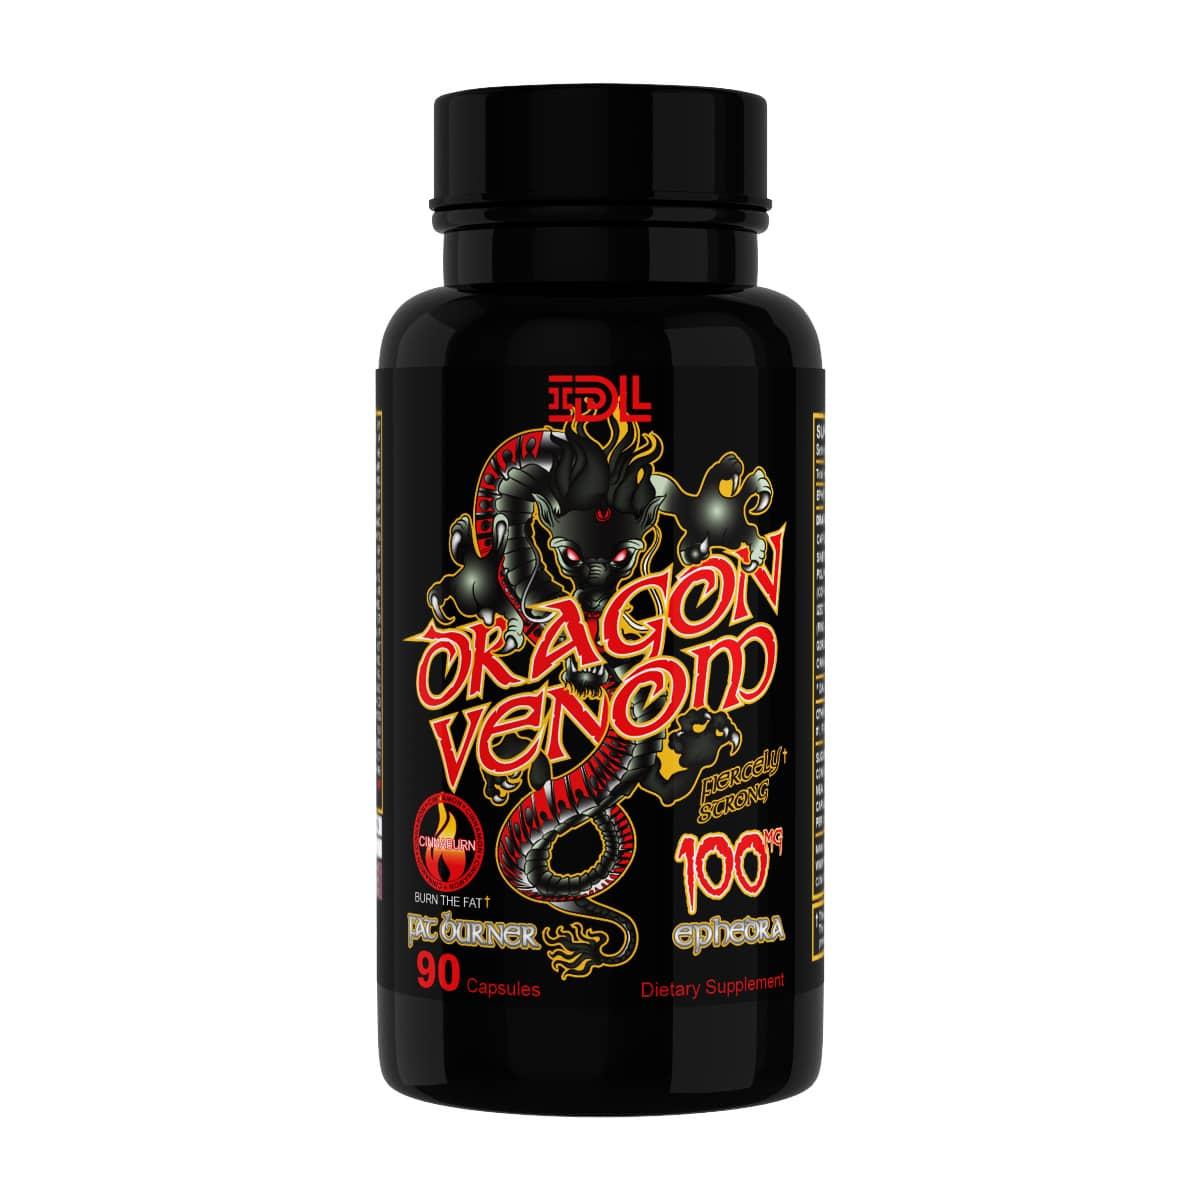 venom fat burner capsules review